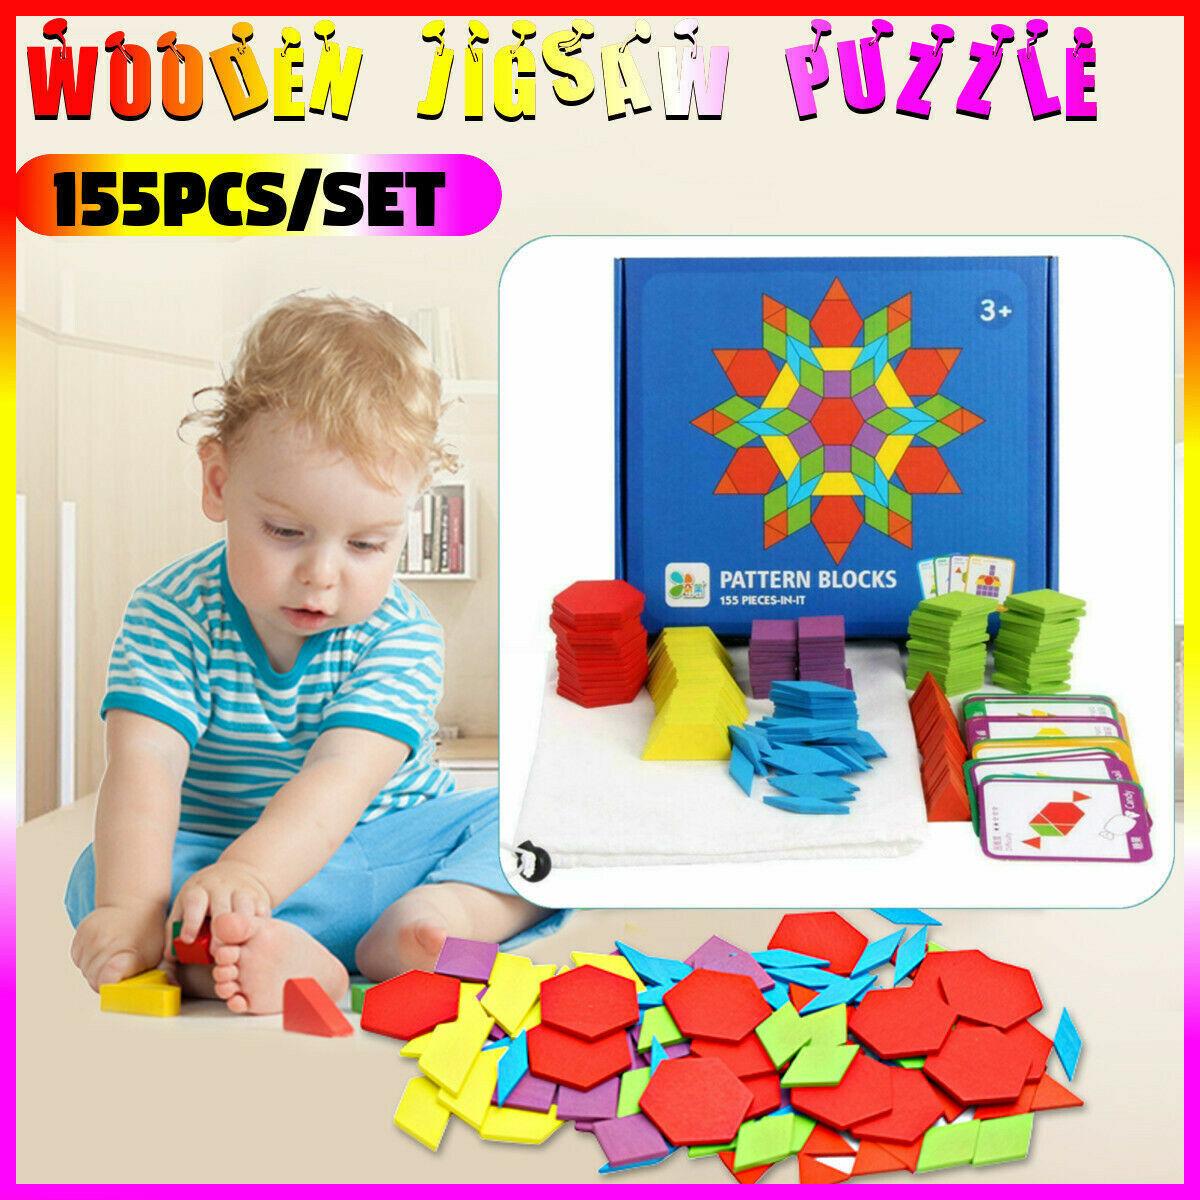 155pcs Wooden Pattern Blocks Puzzle Box Montessori Kids Toys Shapes Dissection